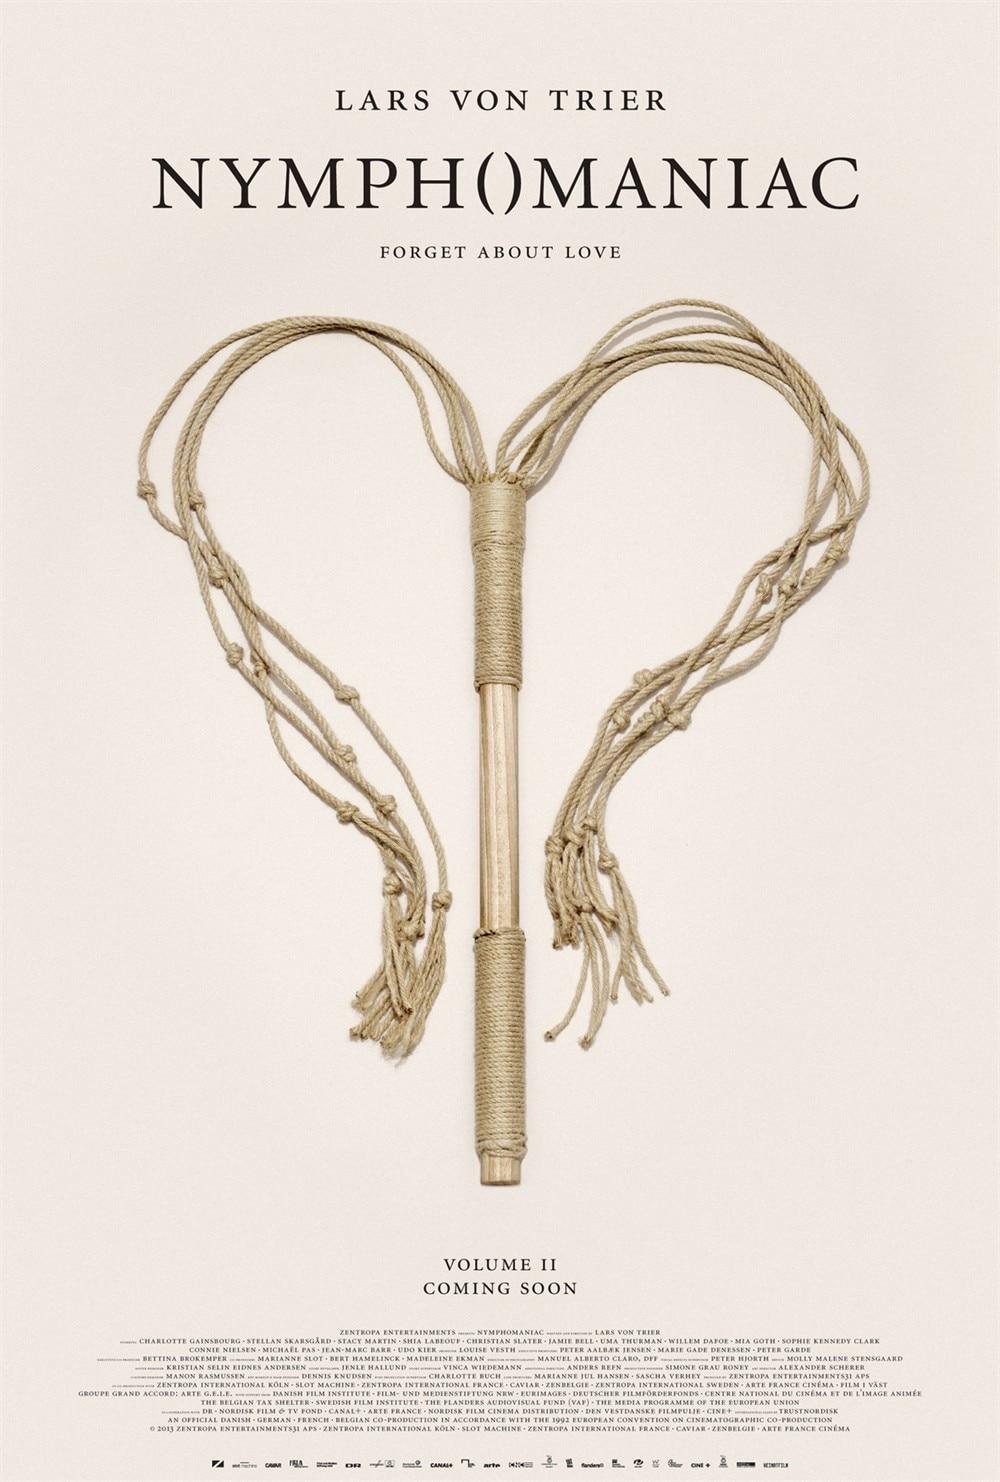 NYMPHOMANIAC фильм Кристиан Слейтер ума Турман Шелковый плакат декоративной живописи 24x36 дюймов - Цвет: Синий